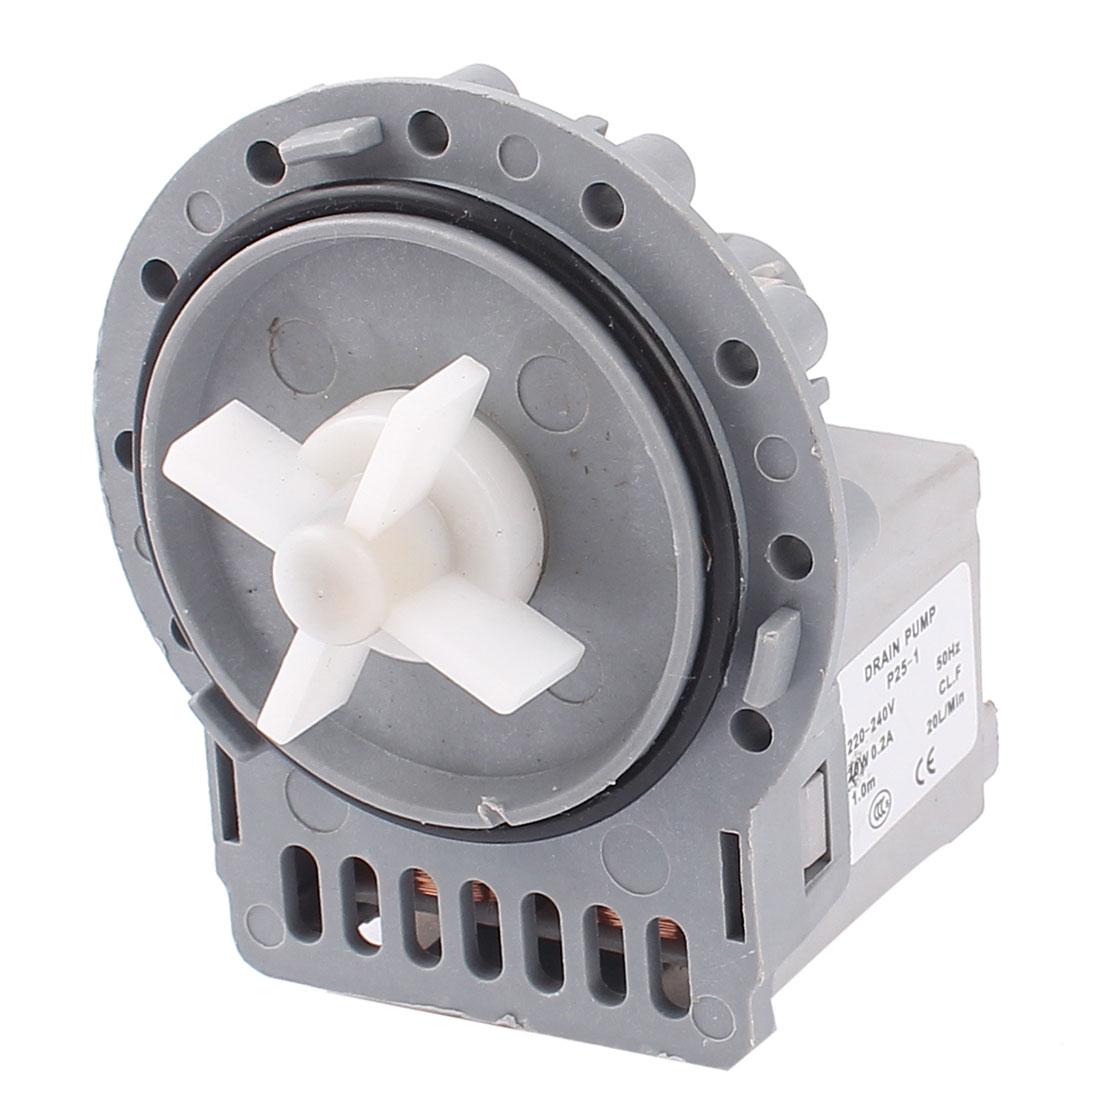 AC 220-240V 50Hz 0.2A 20W Household Washing Machine Water Drain Pump